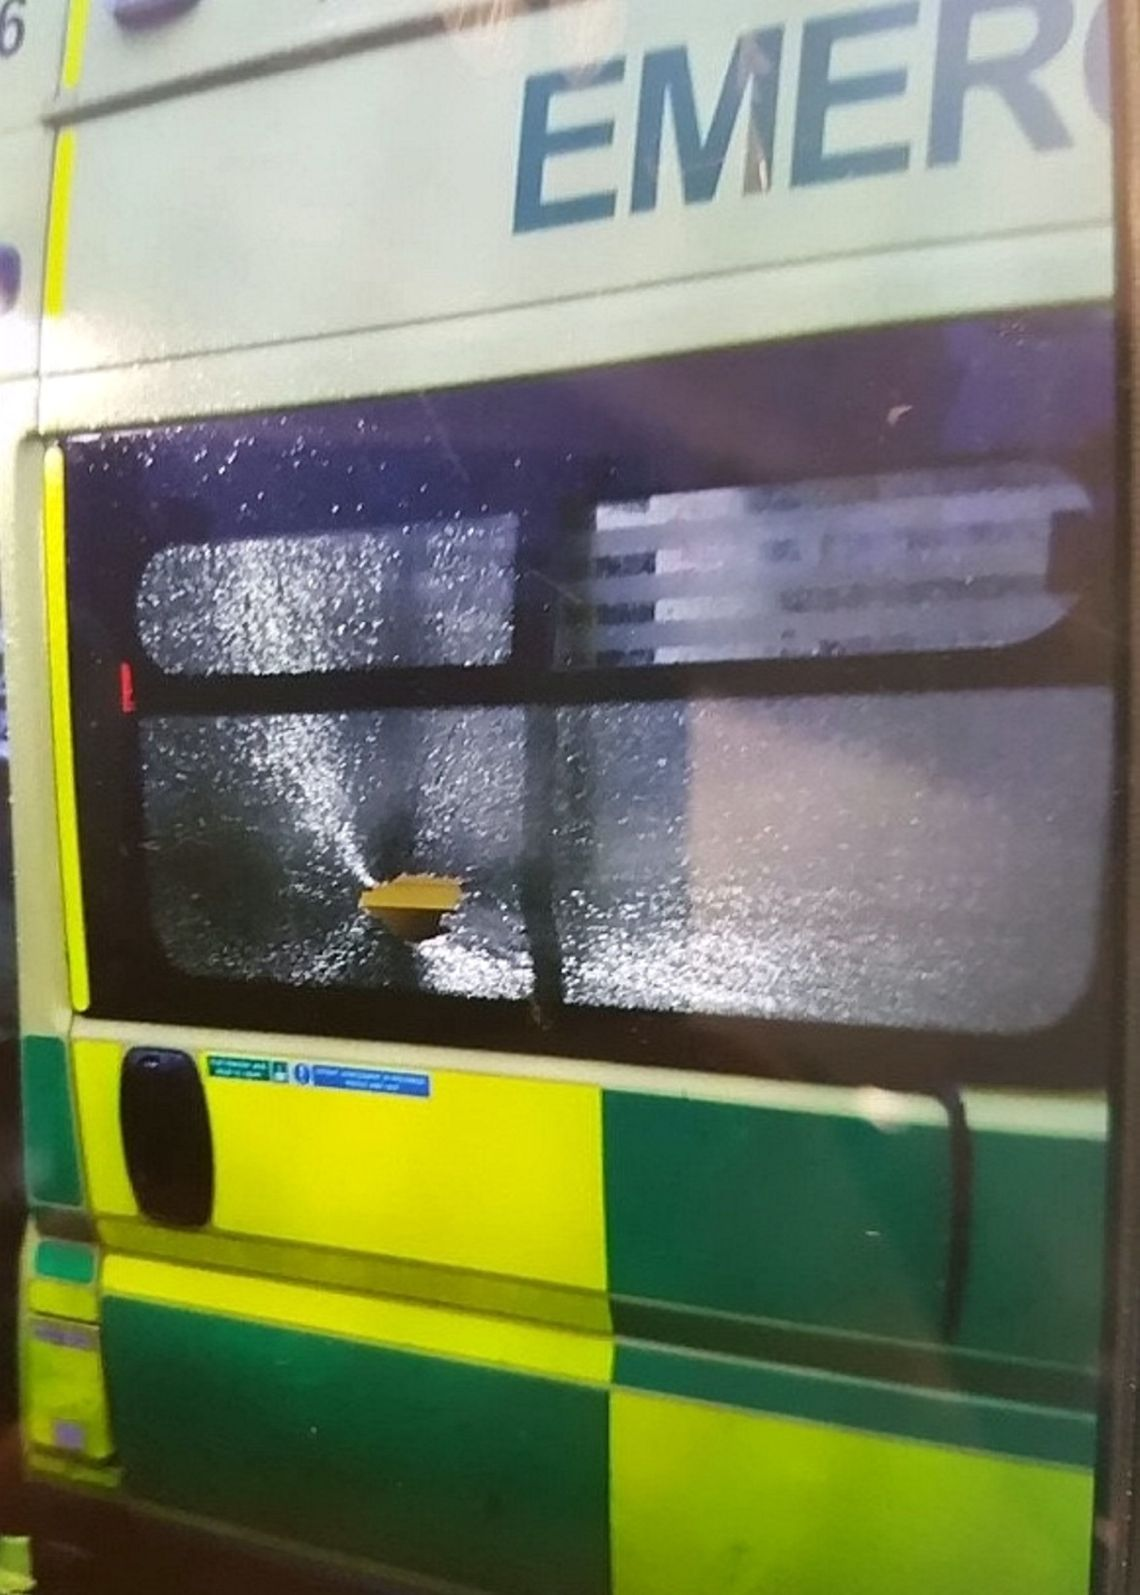 The incident happened last week in the Handworth area of Birmingham.